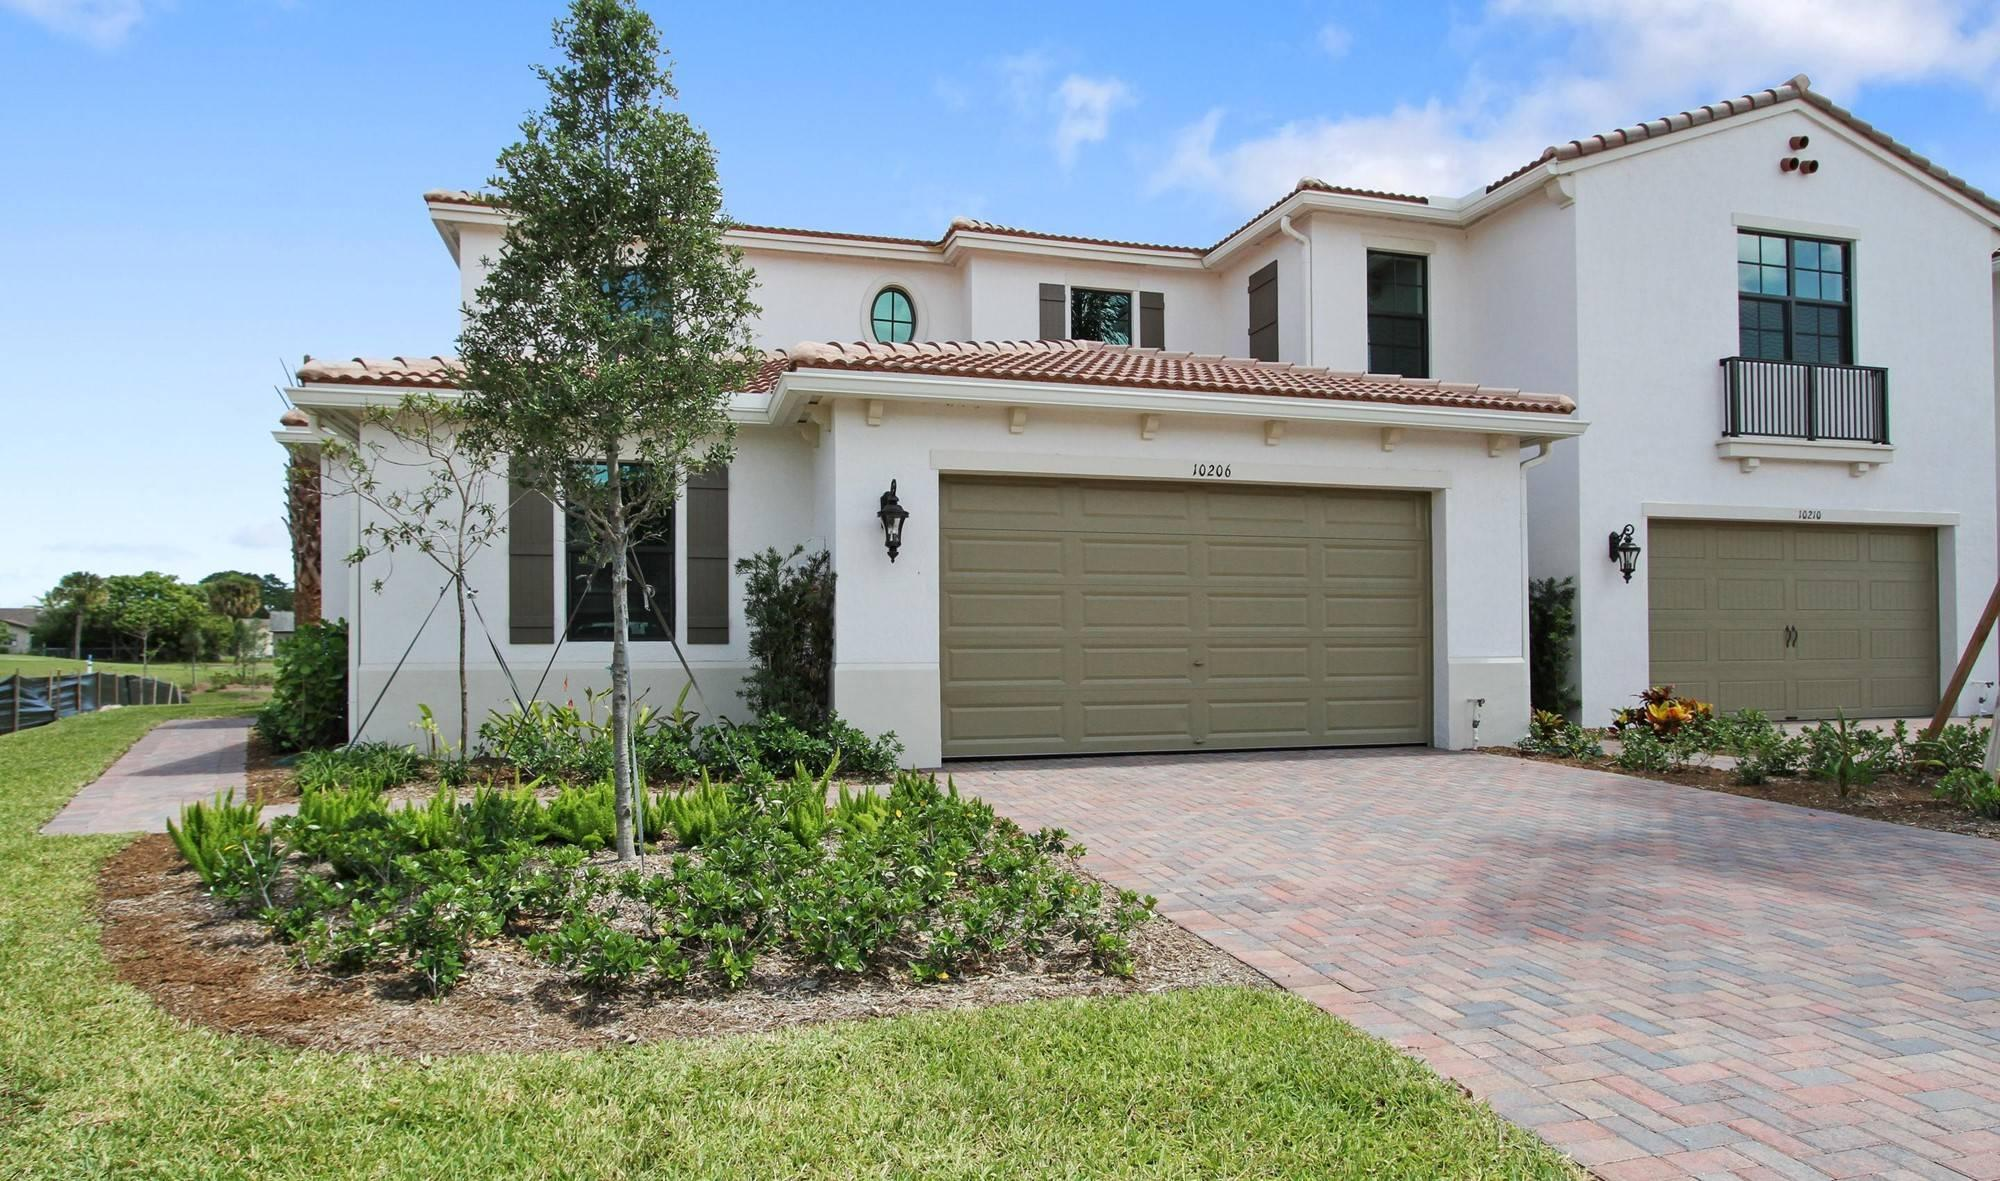 10081  Brickhill Drive 135 For Sale 10642356, FL